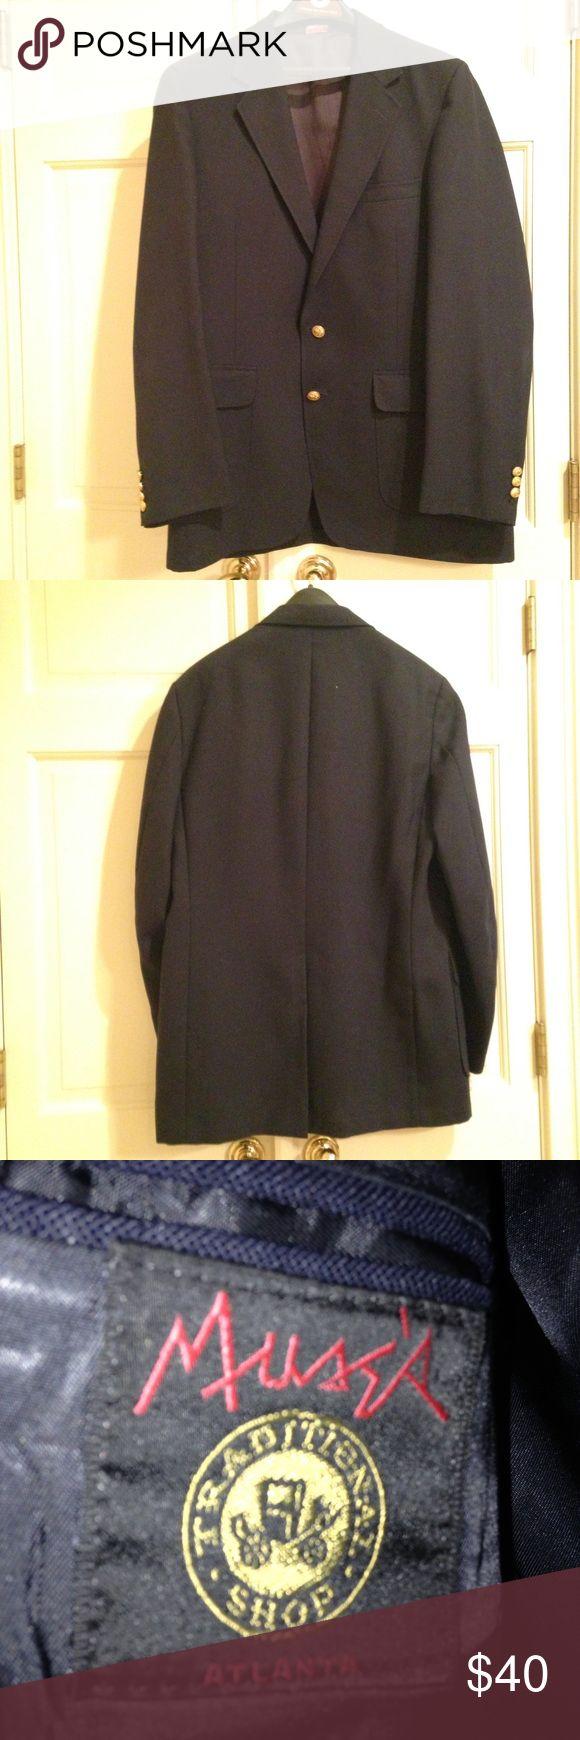 Men's Navy Blazer Men's navy blazer with gold buttons, great condition! Suits & Blazers Sport Coats & Blazers